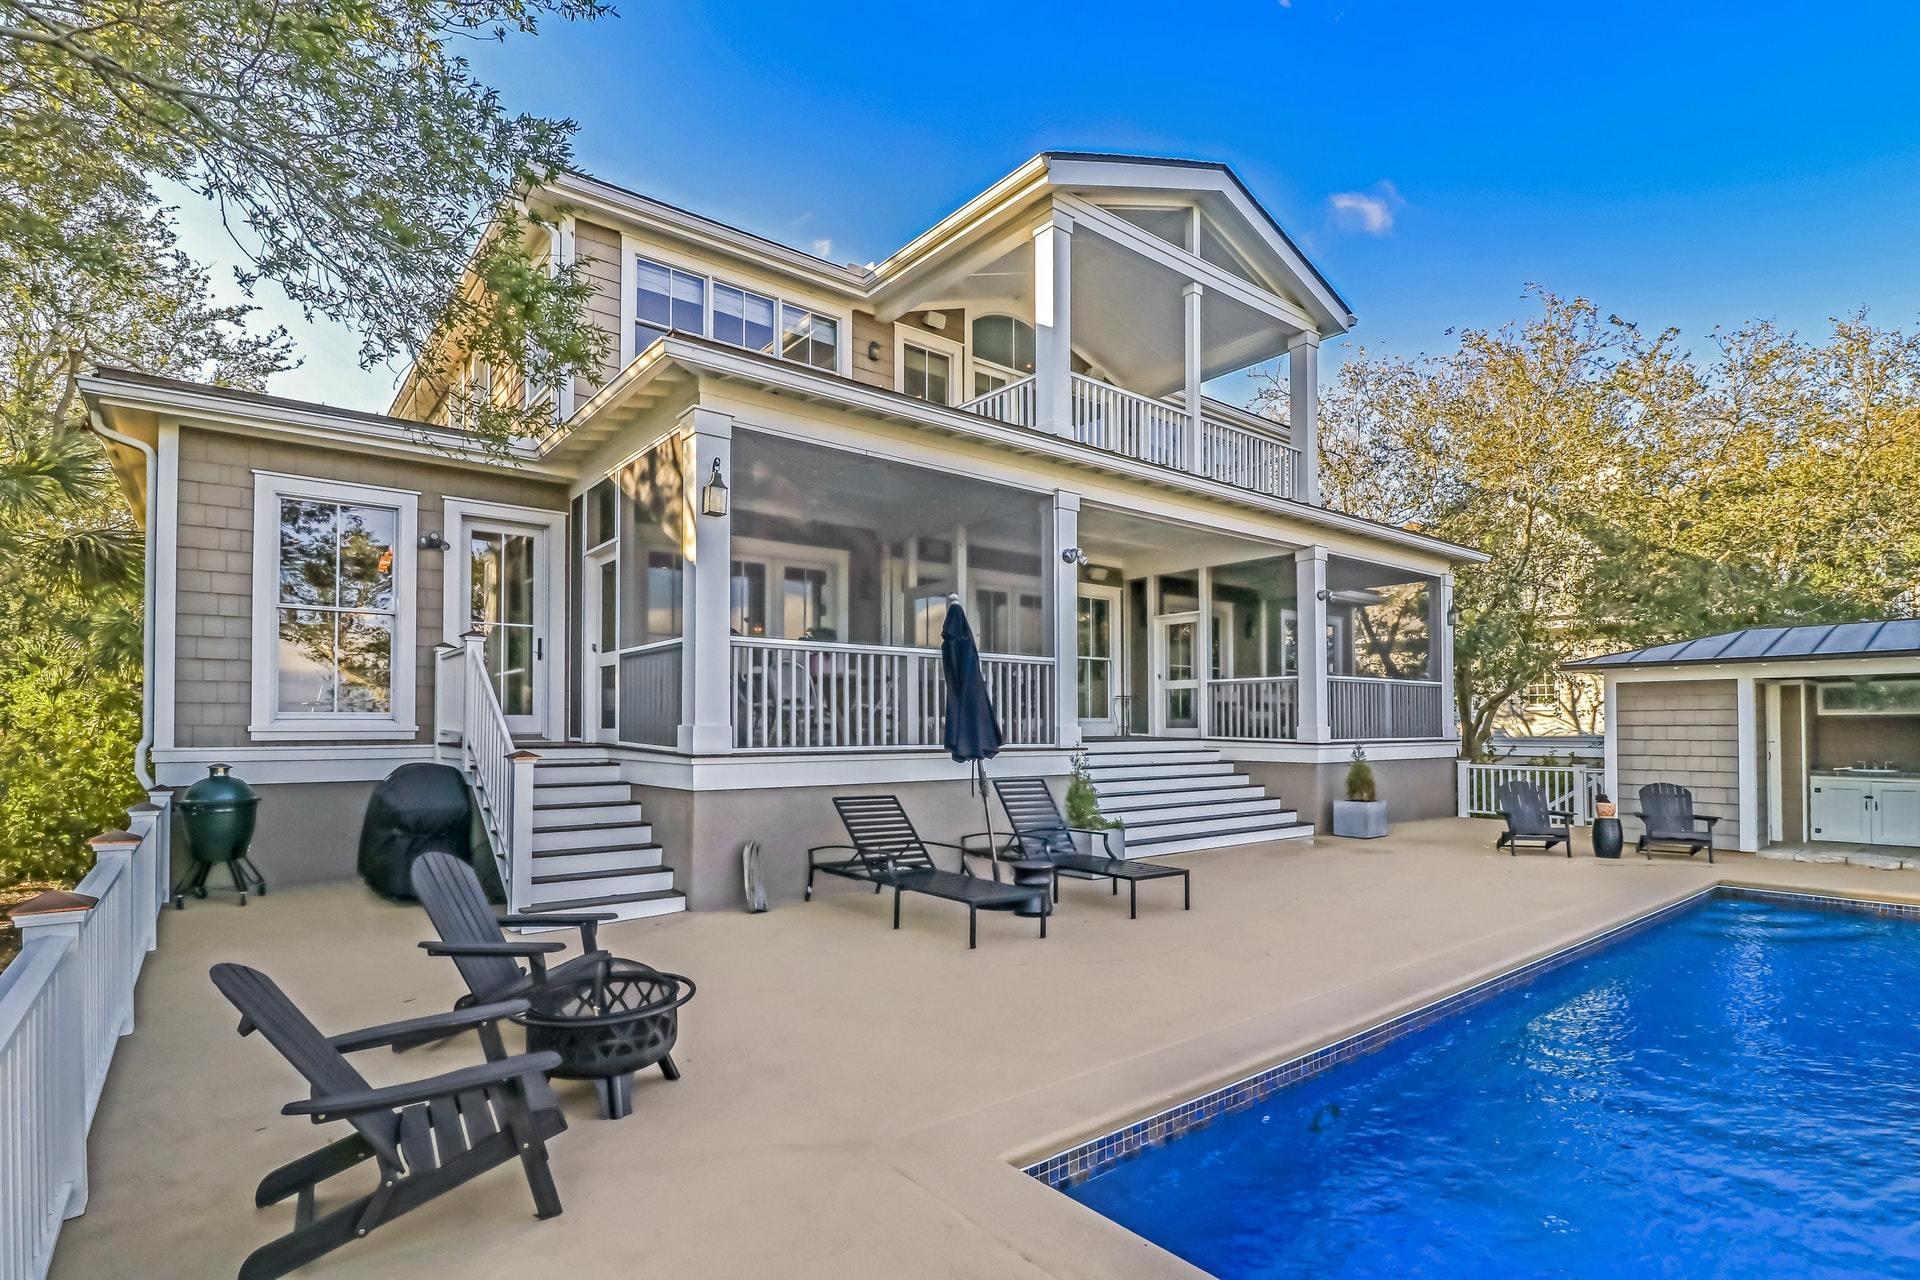 Waterway Island Homes For Sale - 7 Waterway Island Drive, Isle of Palms, SC - 28